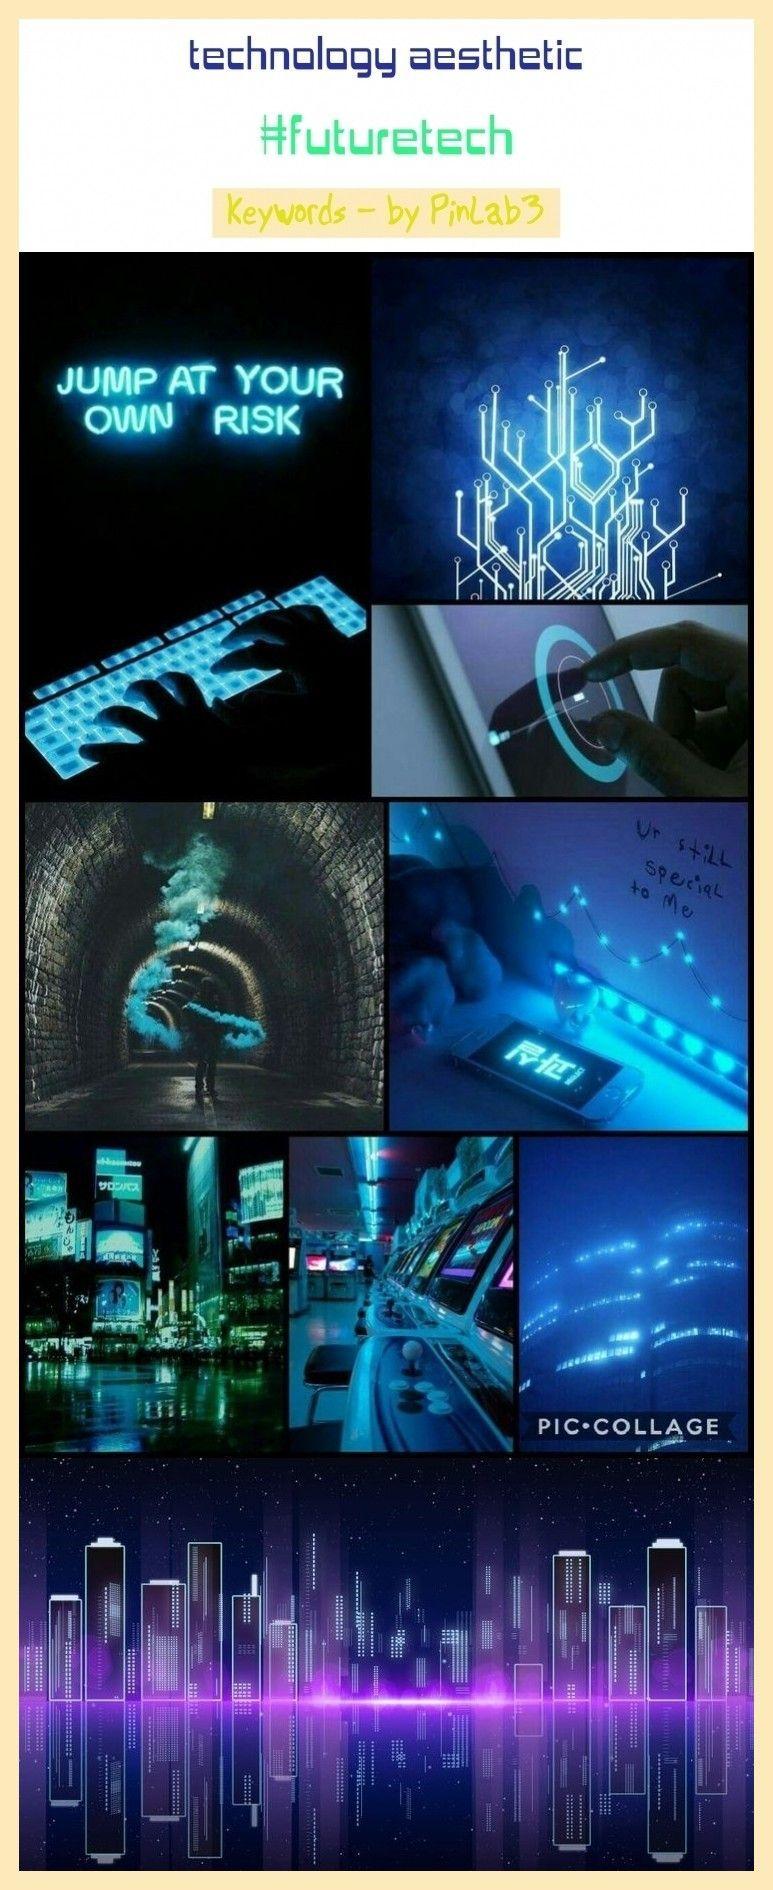 Gadget Hackwrench Tattoo - #GadgetTechnology2020 - Clever Gadget Videos - #HighTechGadget2020 - Gadget Compleanno…